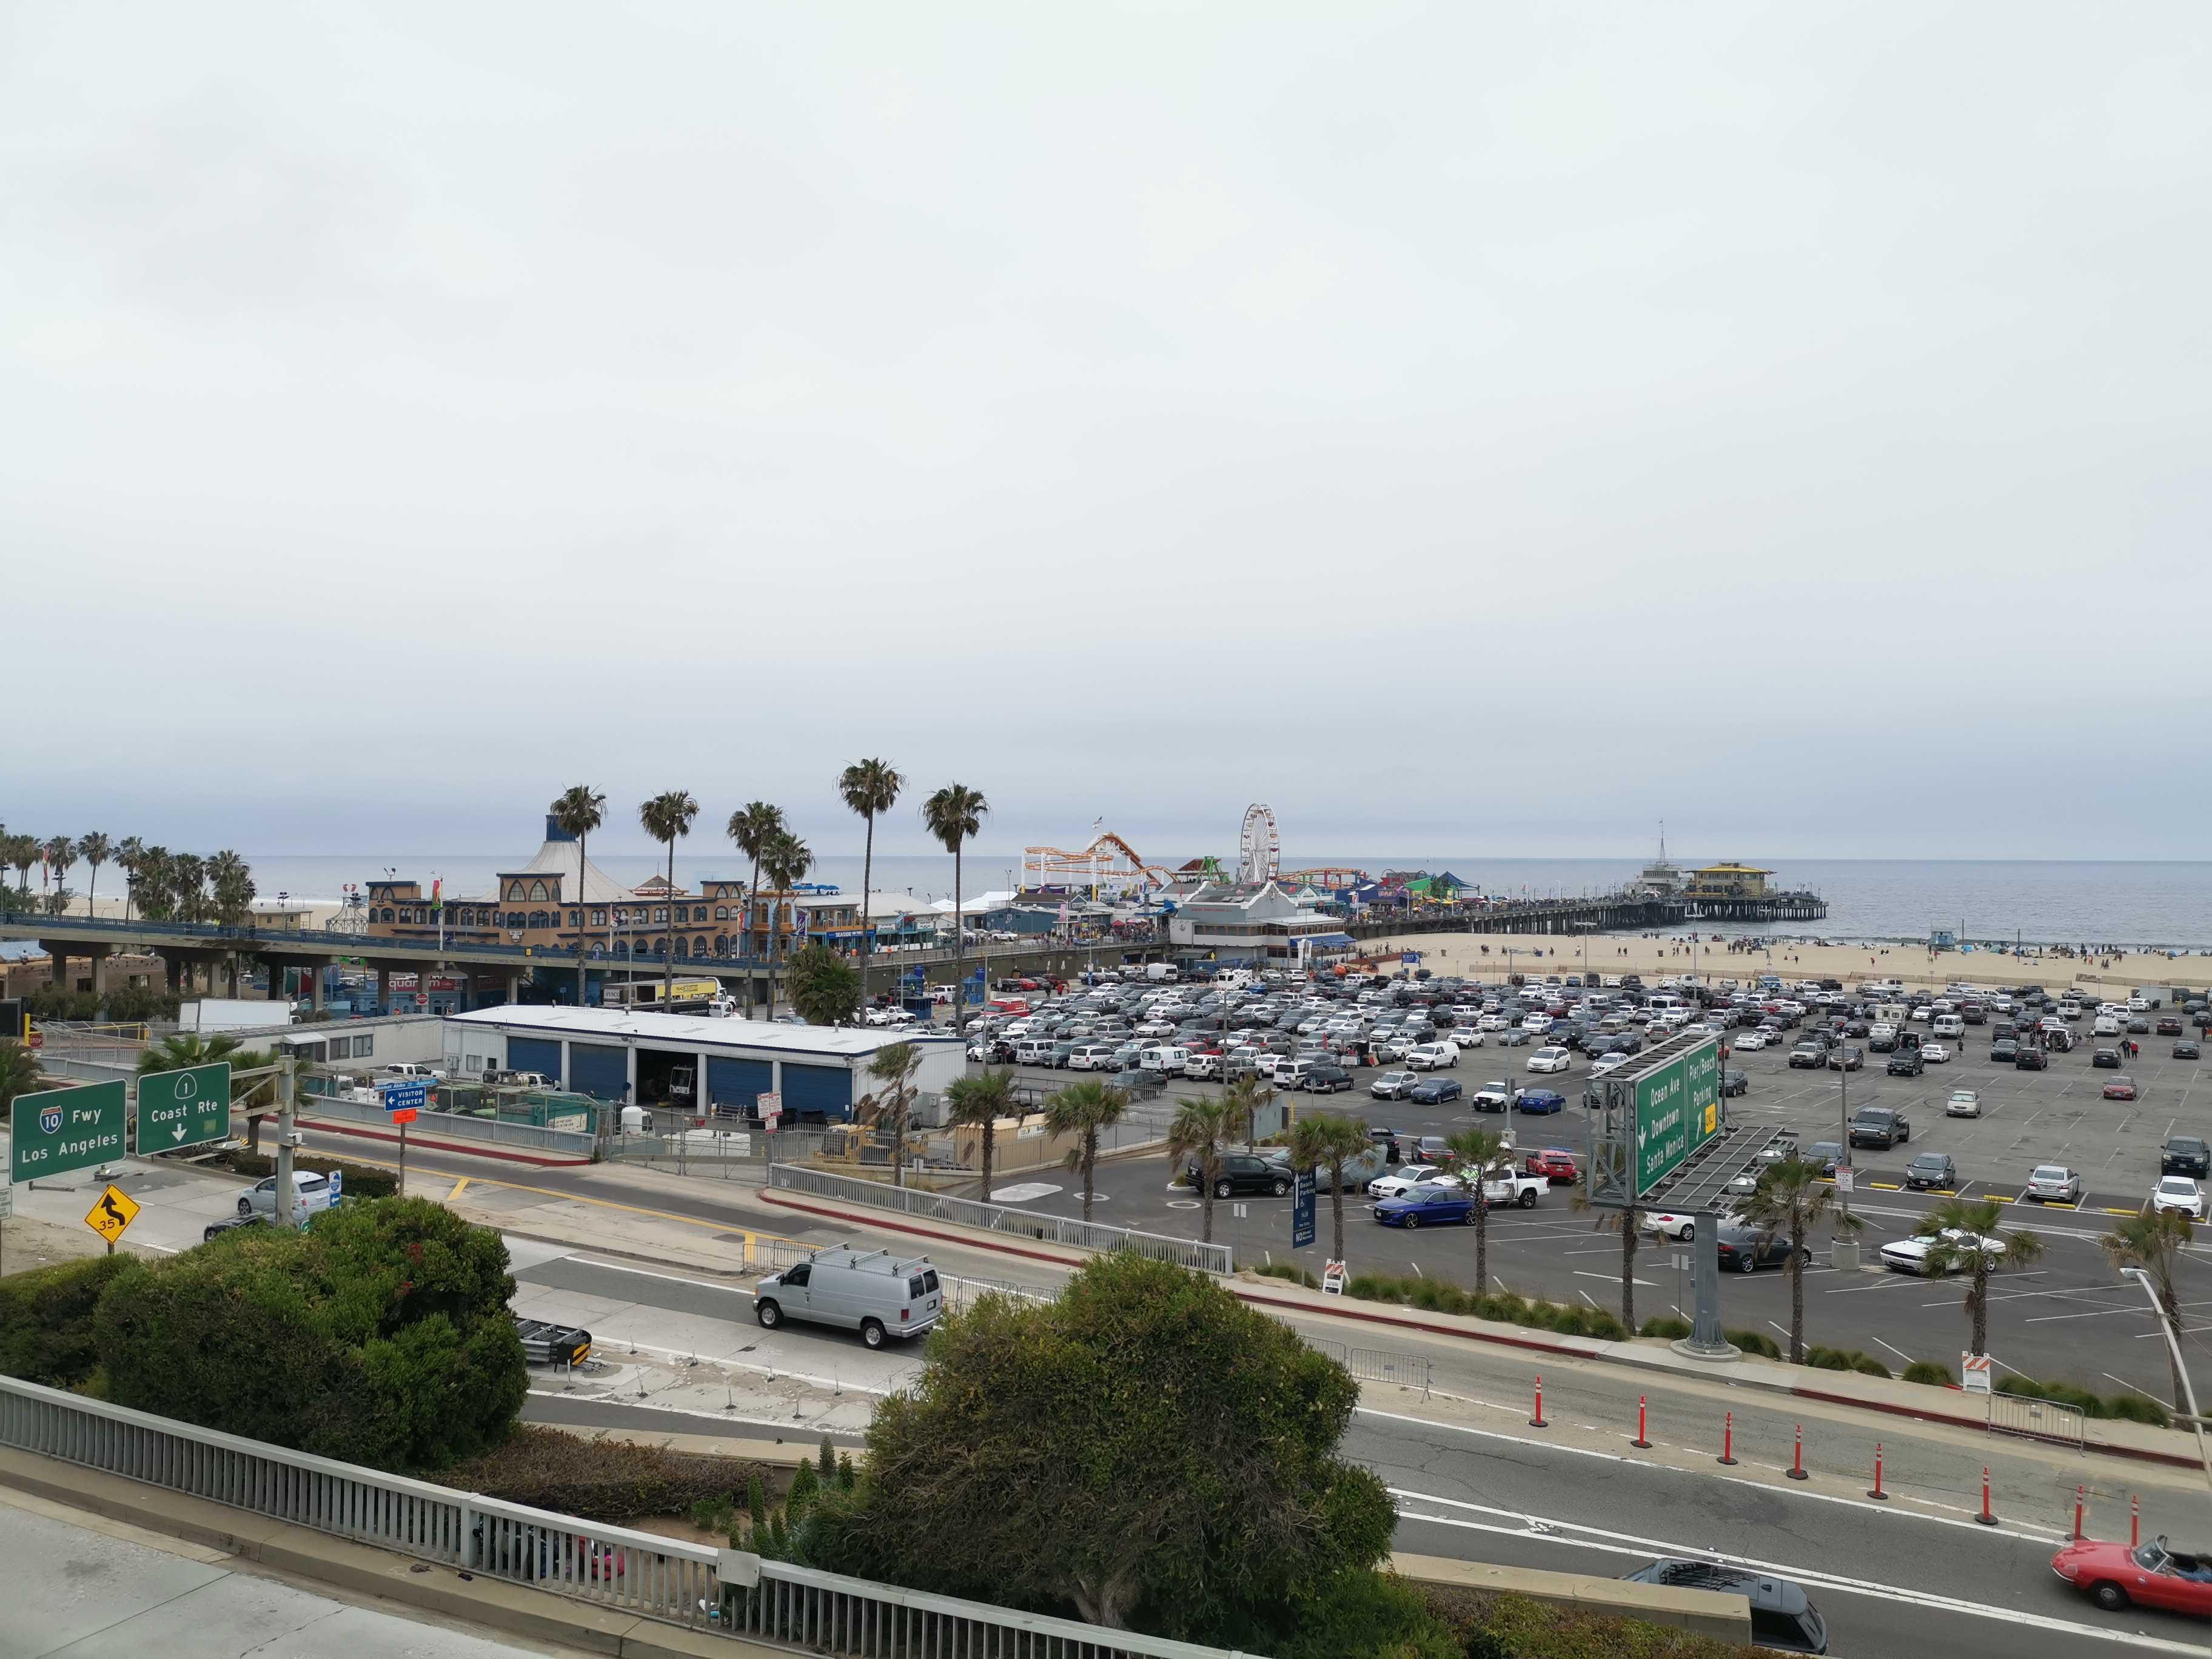 Los Angeles sans trop s'attarder cover image